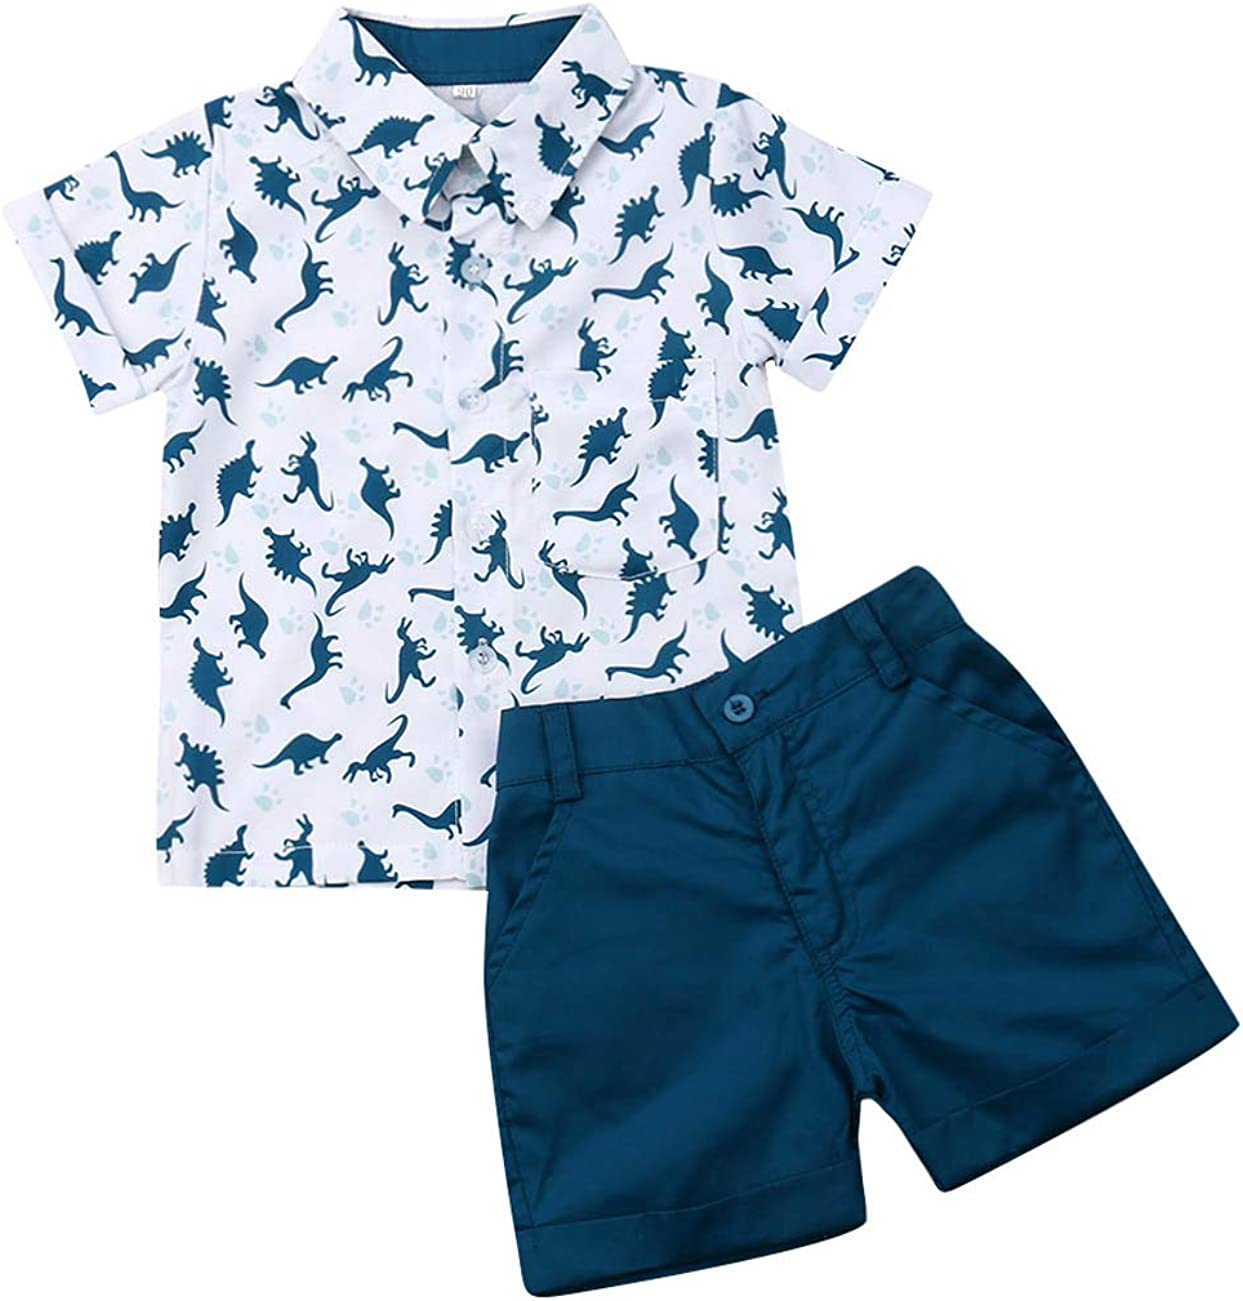 Toddler Baby Boy Flamingo Print Clothes Short Sleeve Button Down T-Shirts Shorts Set Kids 2Pcs Summer Outfits